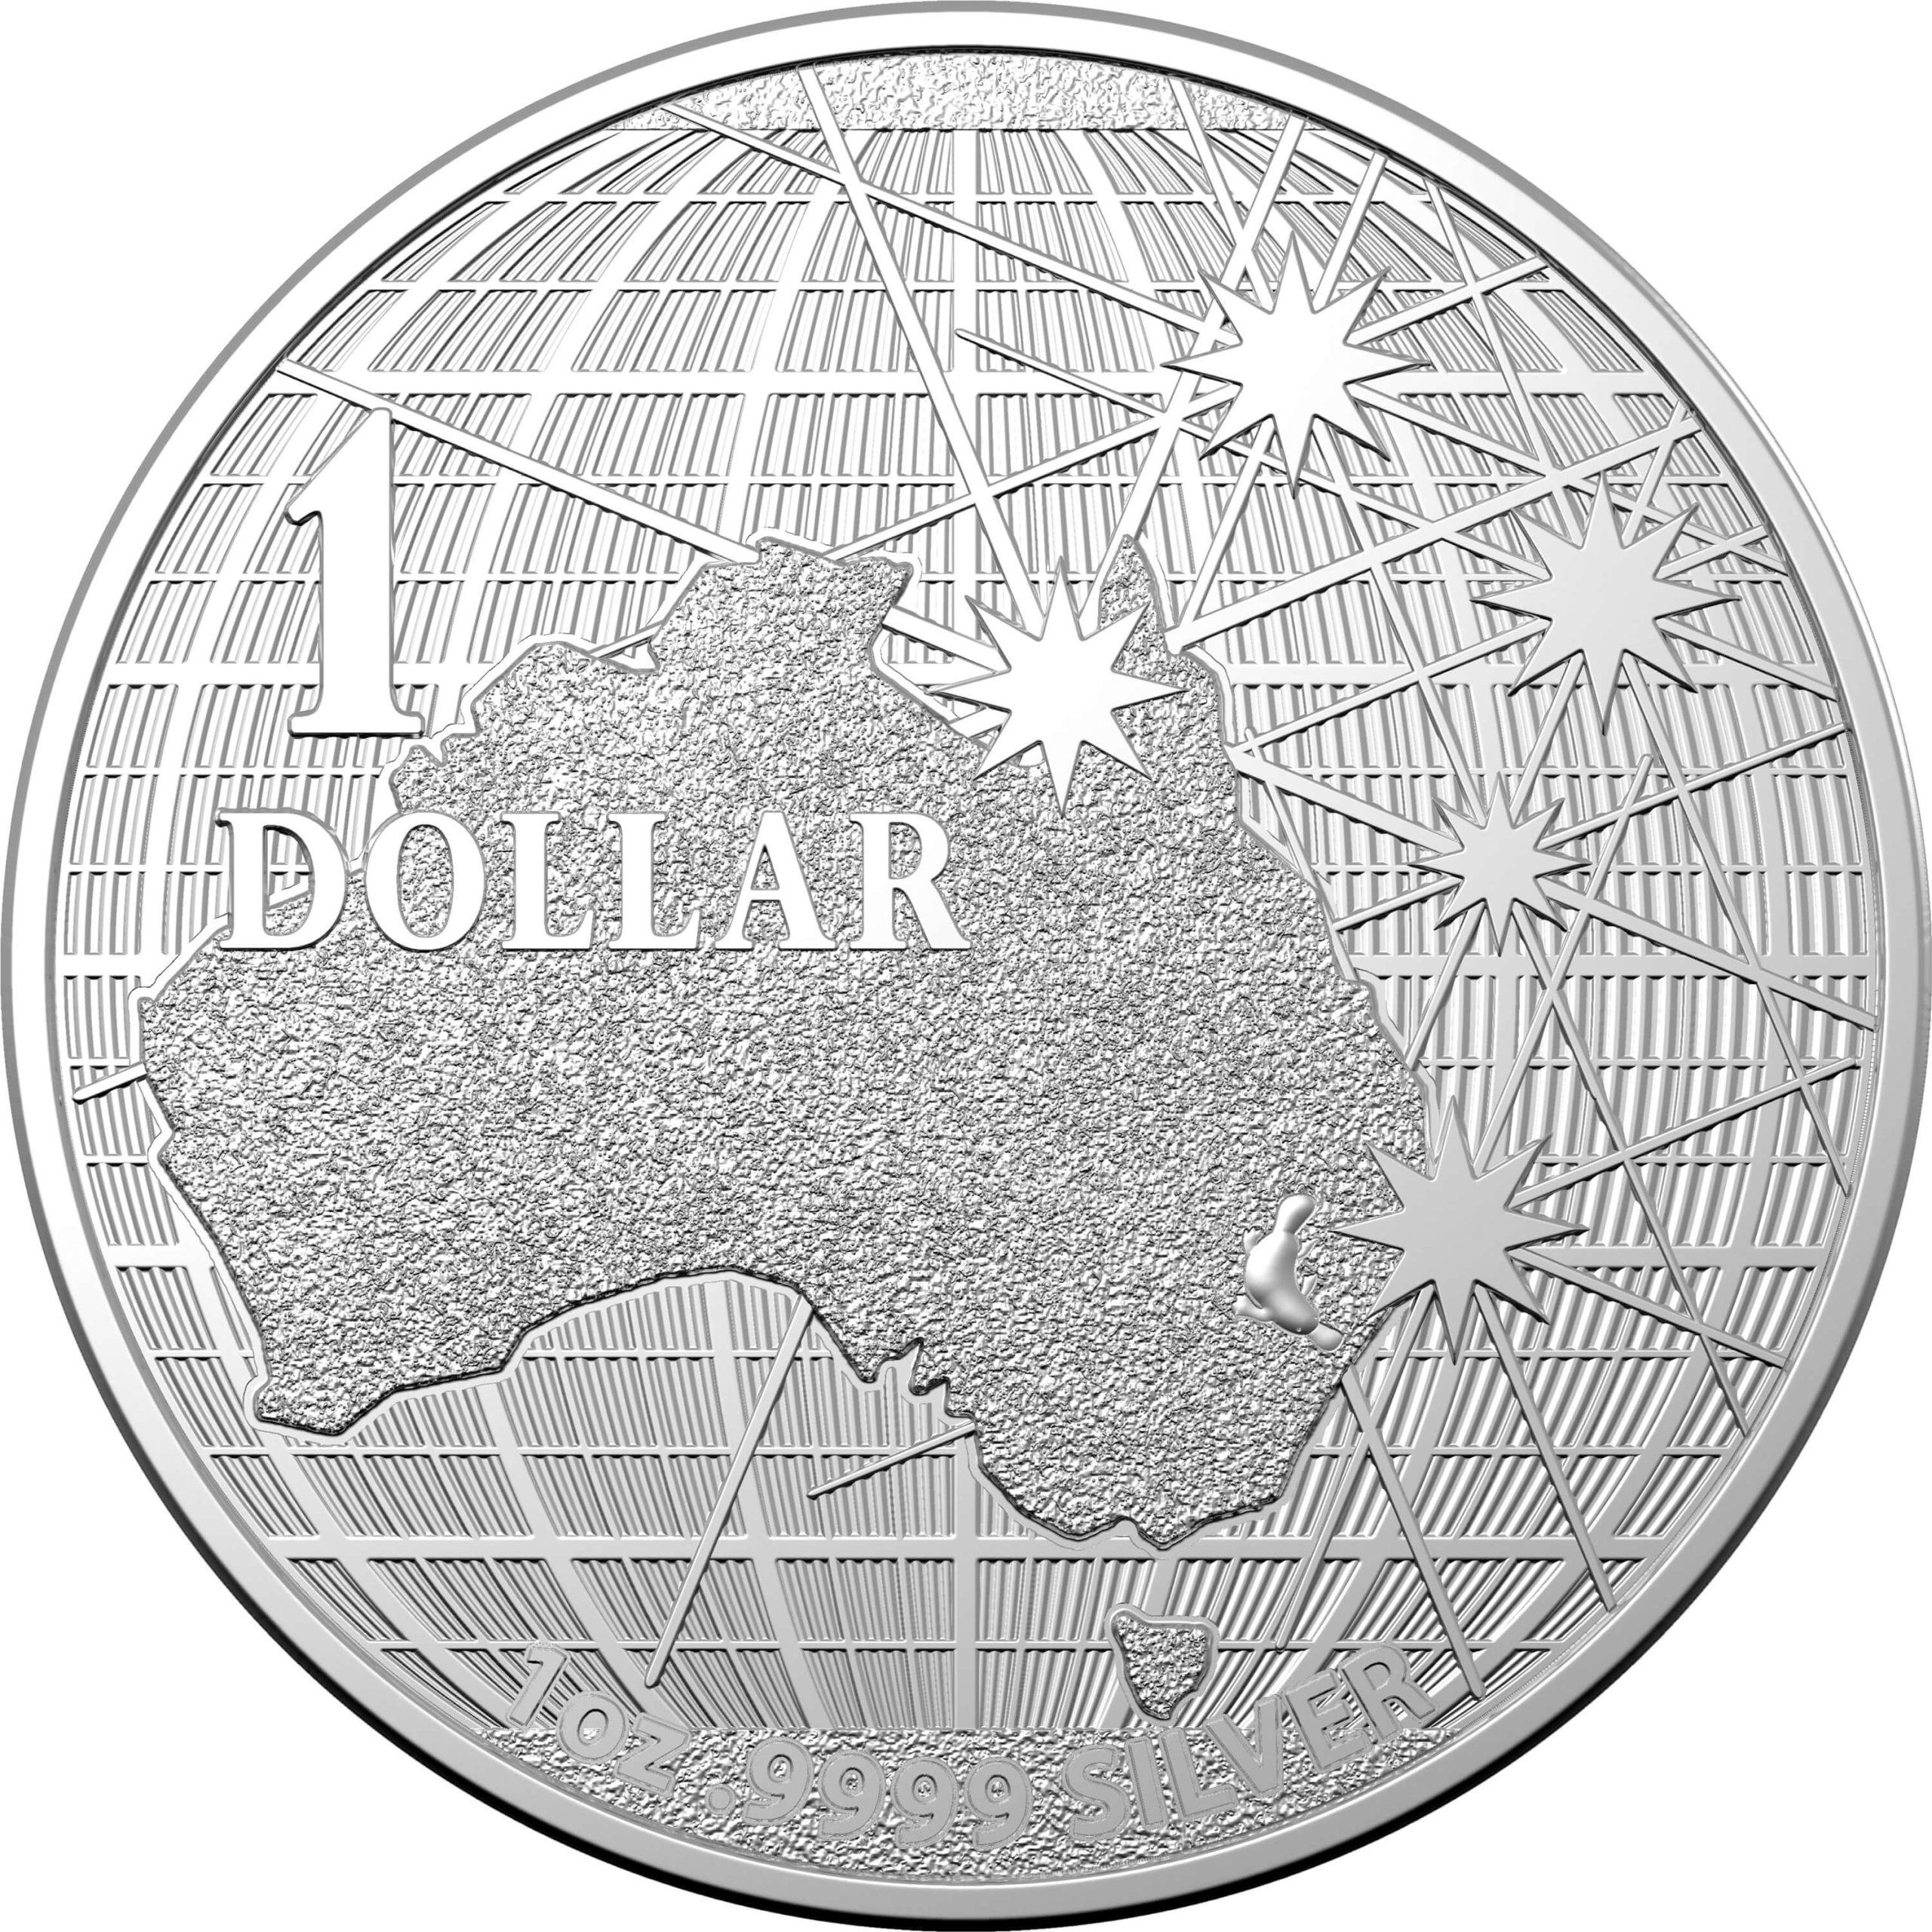 2021 $1 Beneath the Southern Skies 1oz .9999 Silver Bullion Coin - Platypus 1